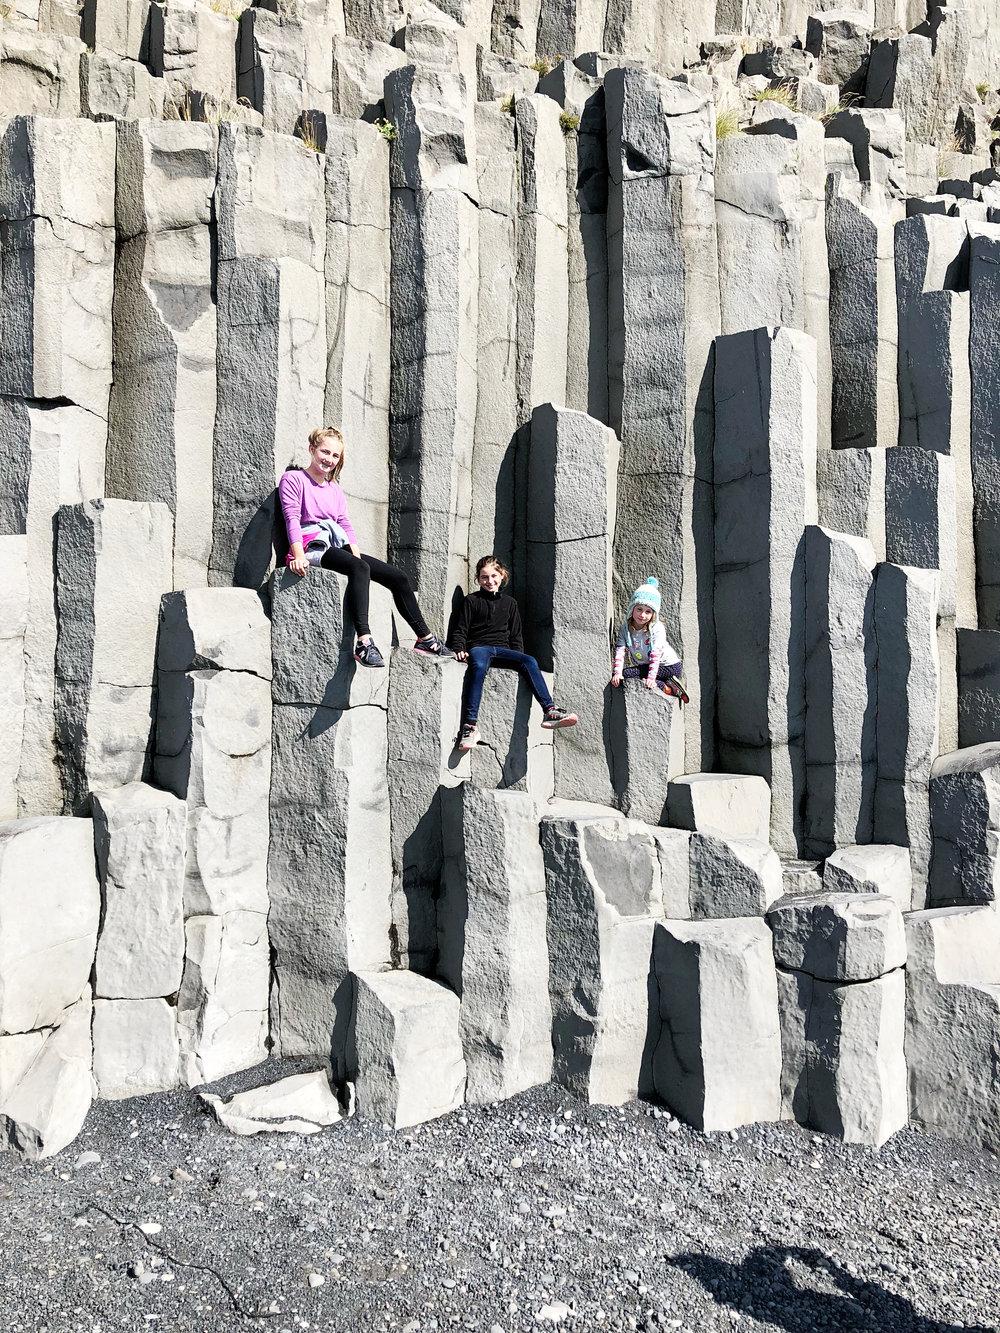 Reynisfjara Black Sand Beach on Iceland's South Coast